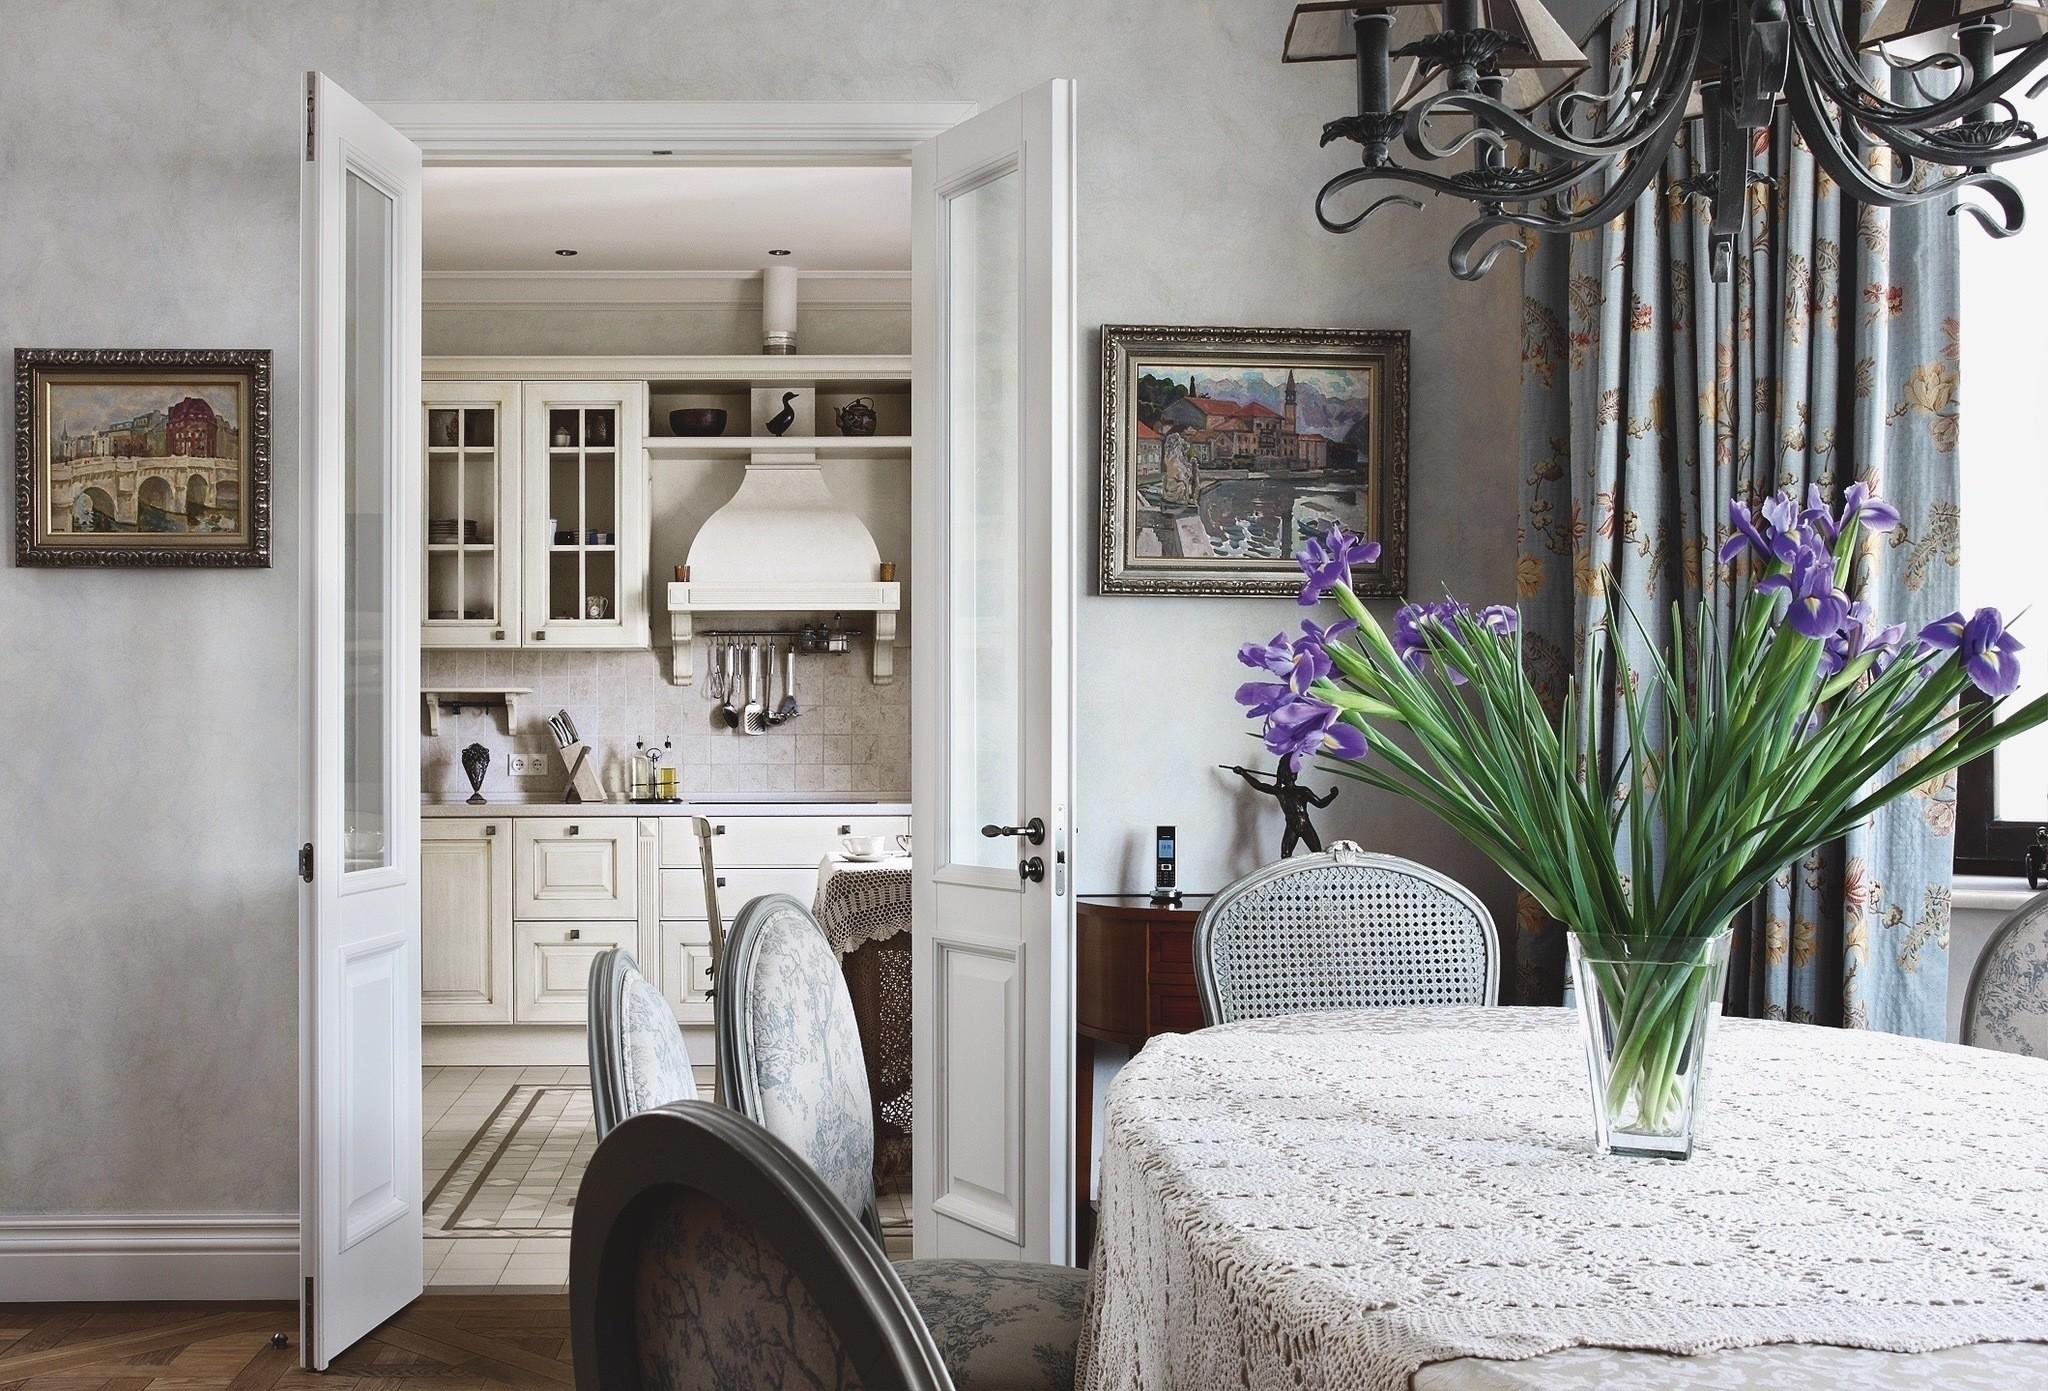 Белая кухонная дверь